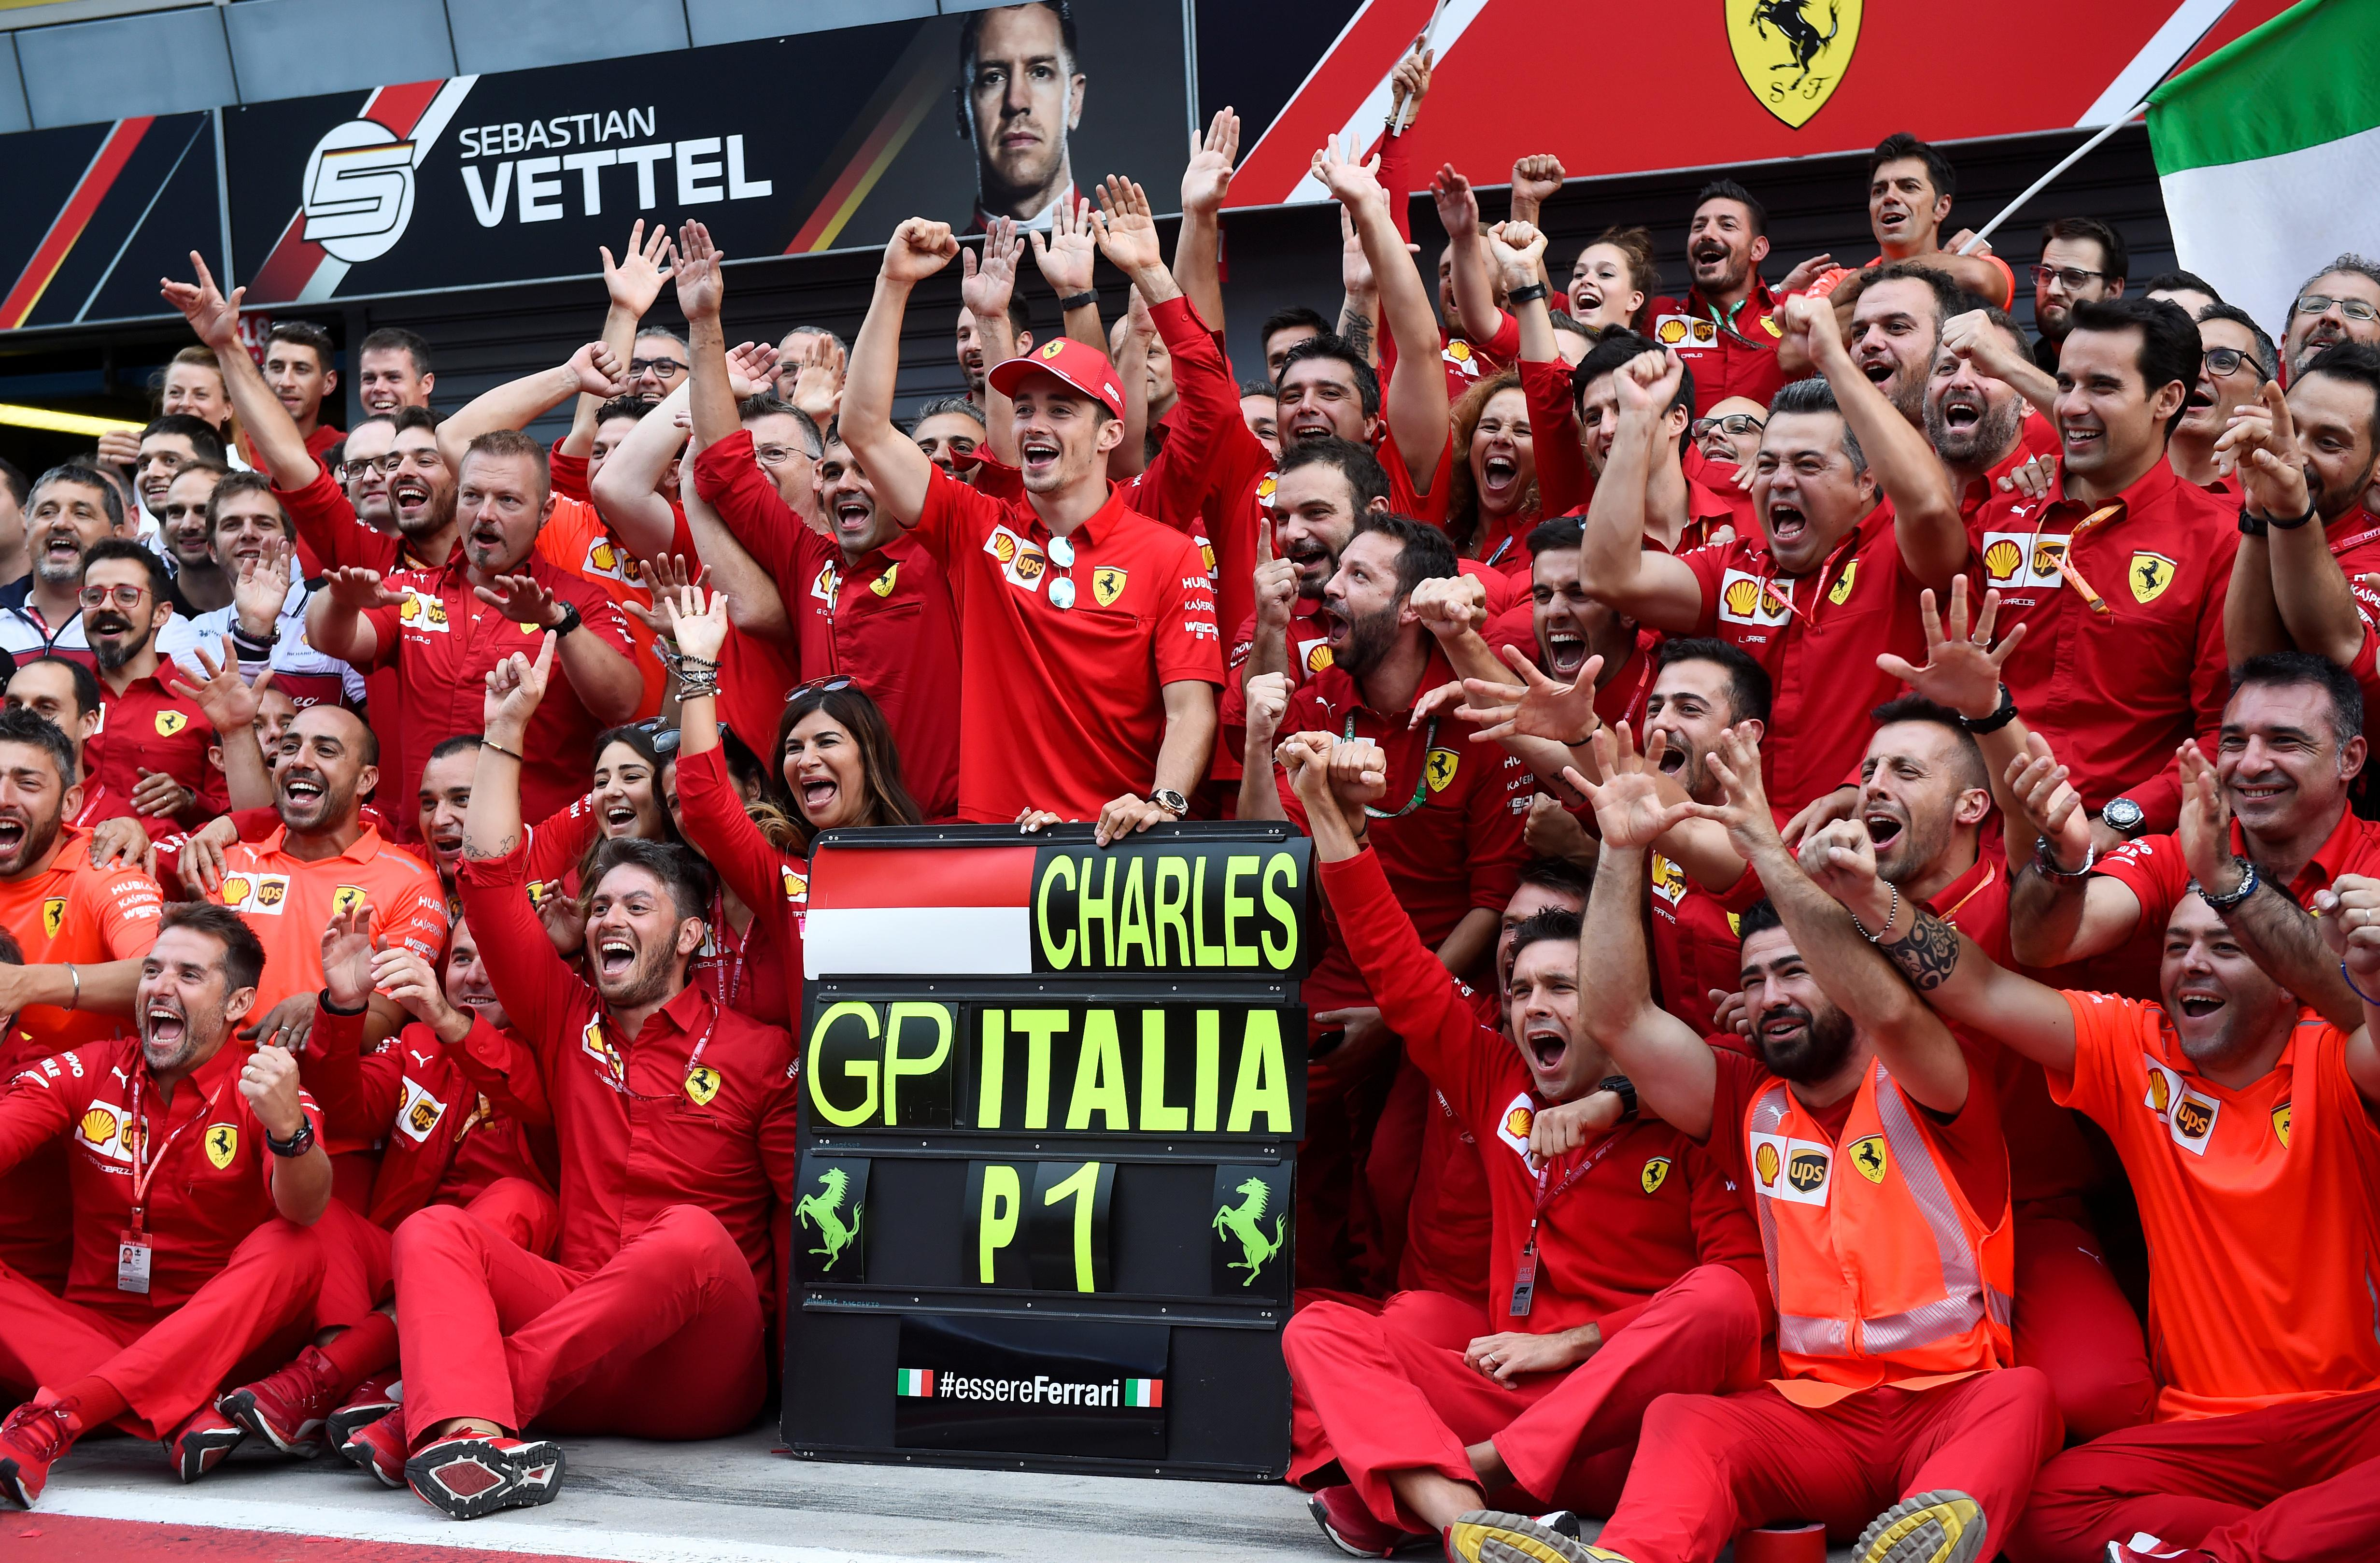 Leclerc triggers Ferrari frenzy with Italian GP win